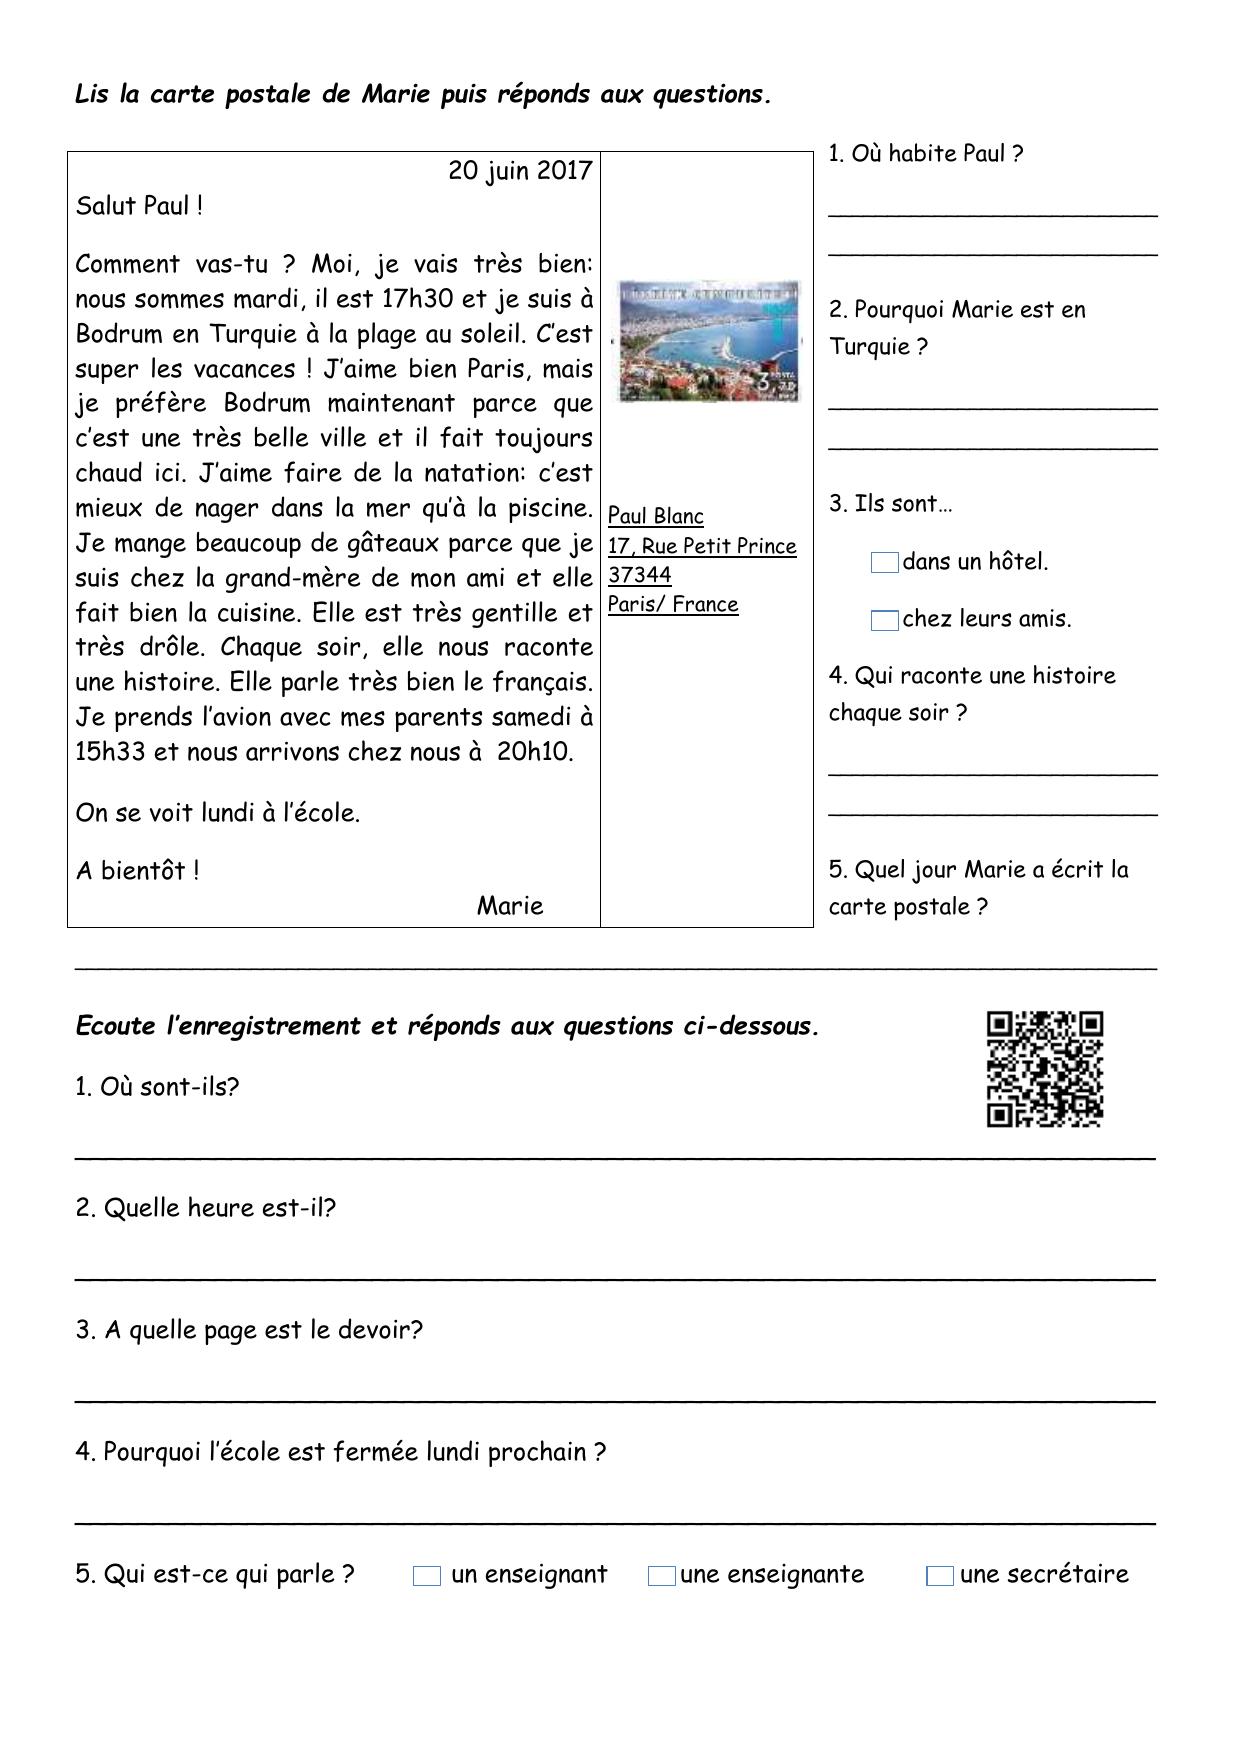 Comprehension Ecrite Et Orale Comprehension Ecrite Texte Questions Comprehension 101144